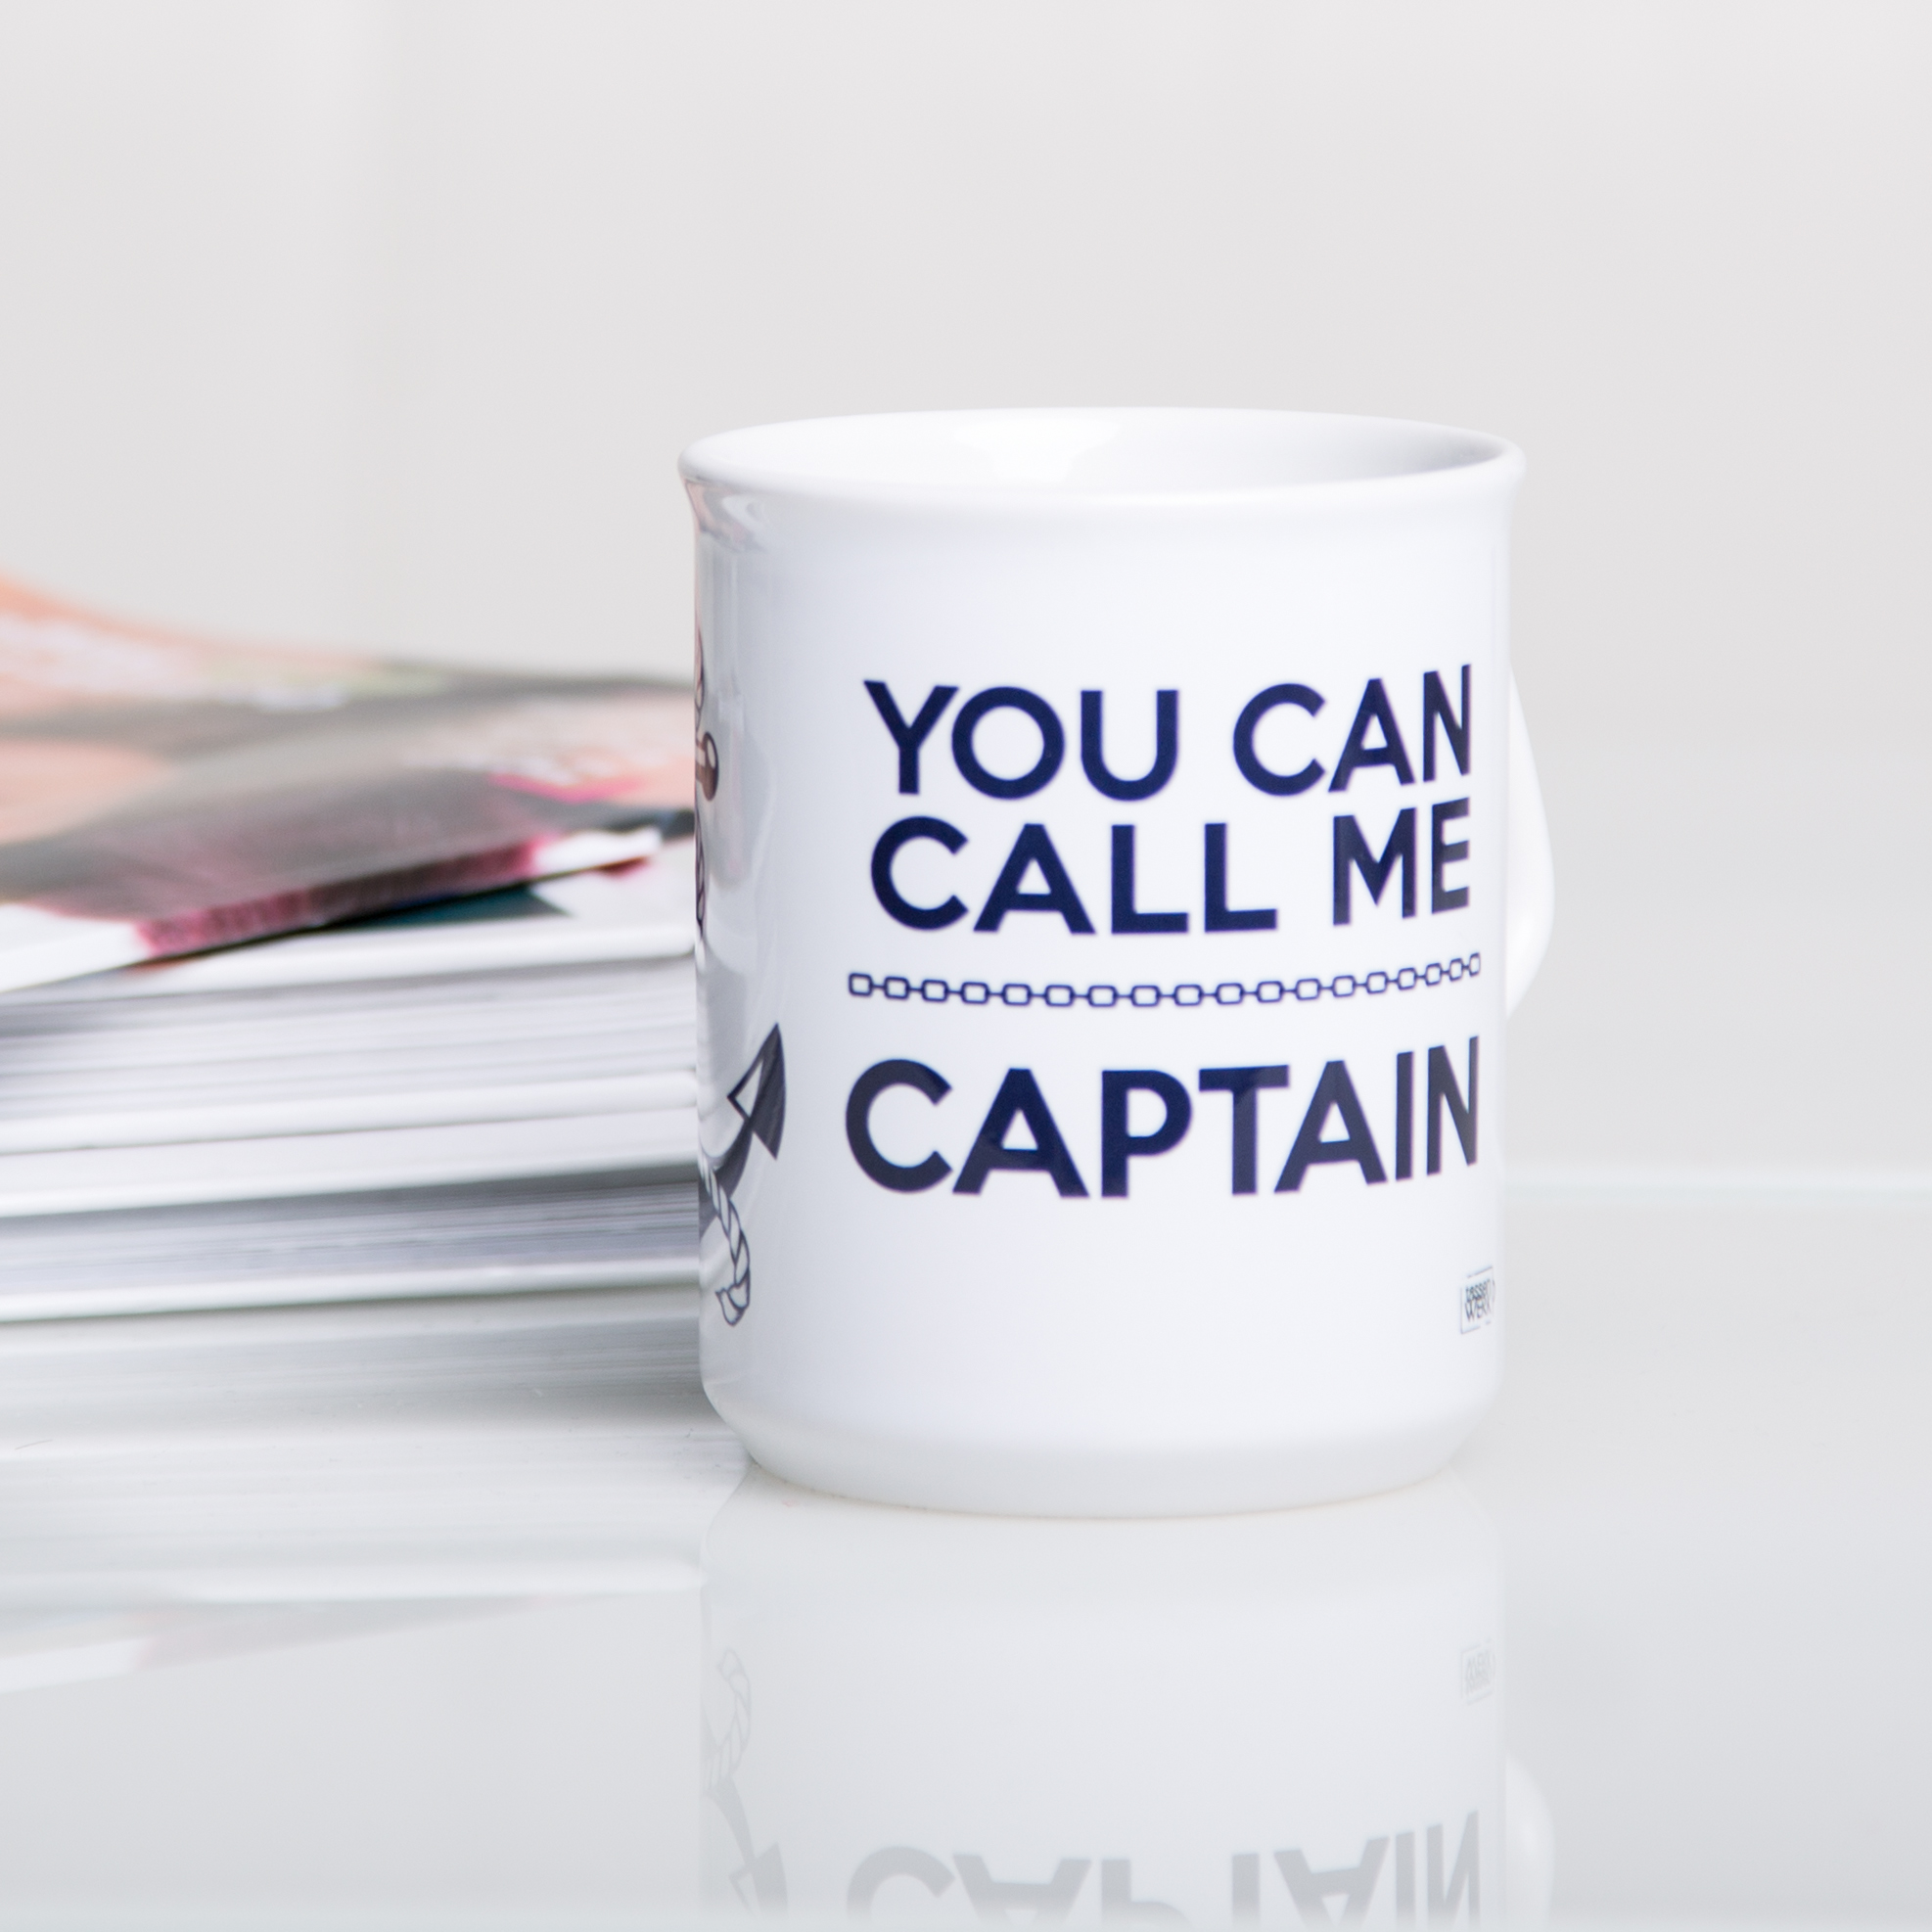 CALL ME CAPTAIN